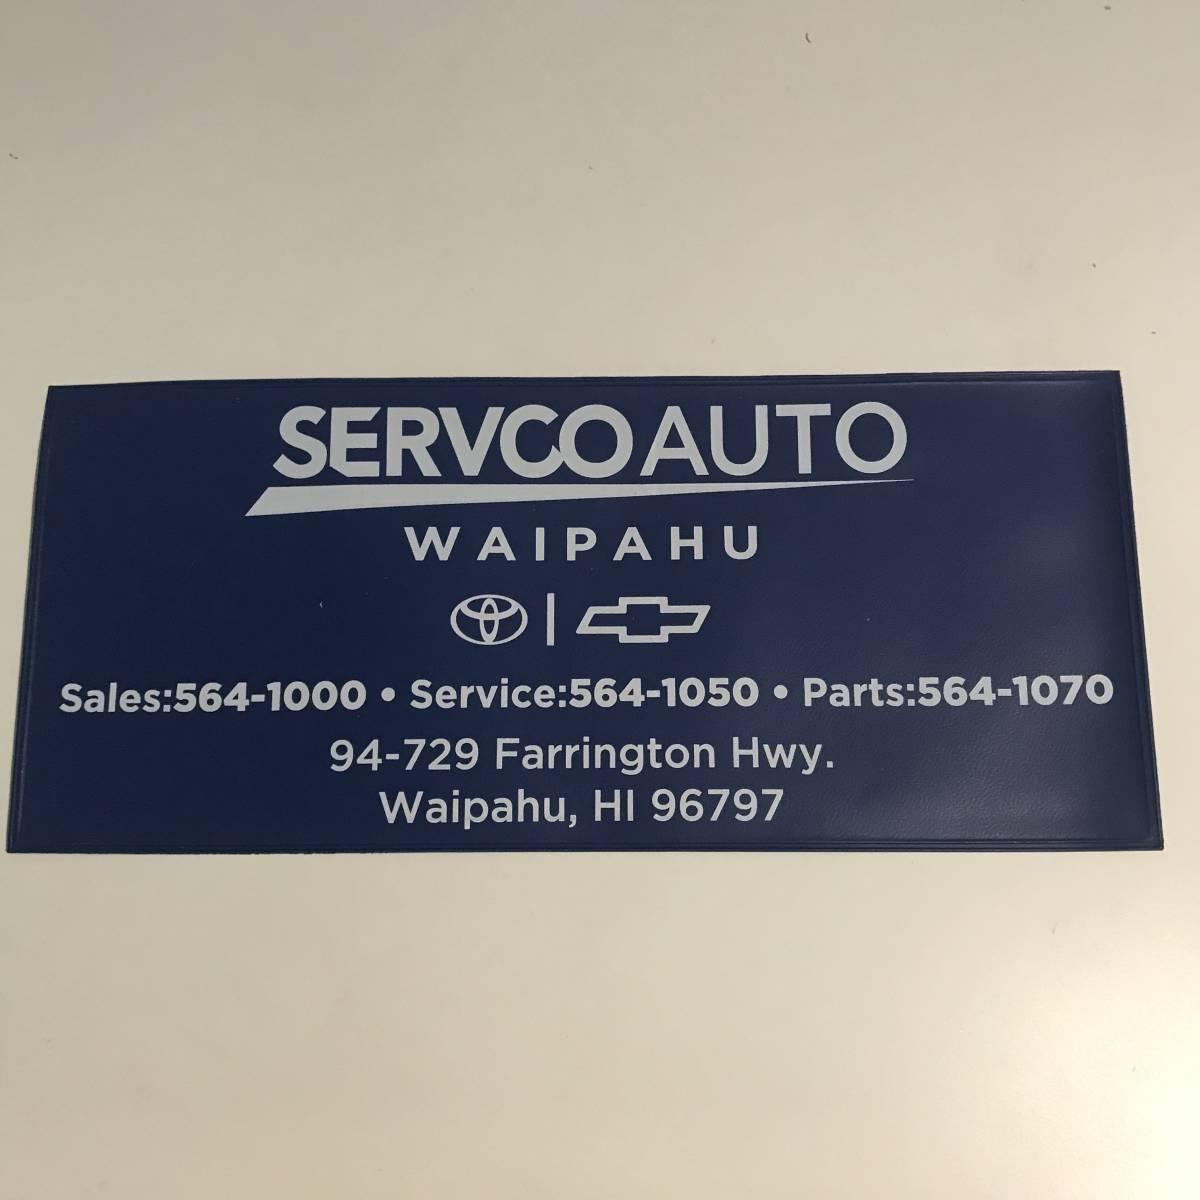 HAWAII SERVCO TOYOTA WAIPAHU REGISTRATION DOCUMENT BAG ハワイ サーフコ トヨタ ワイパフ レジストレーション 車検証 書類入れ USDM HDM